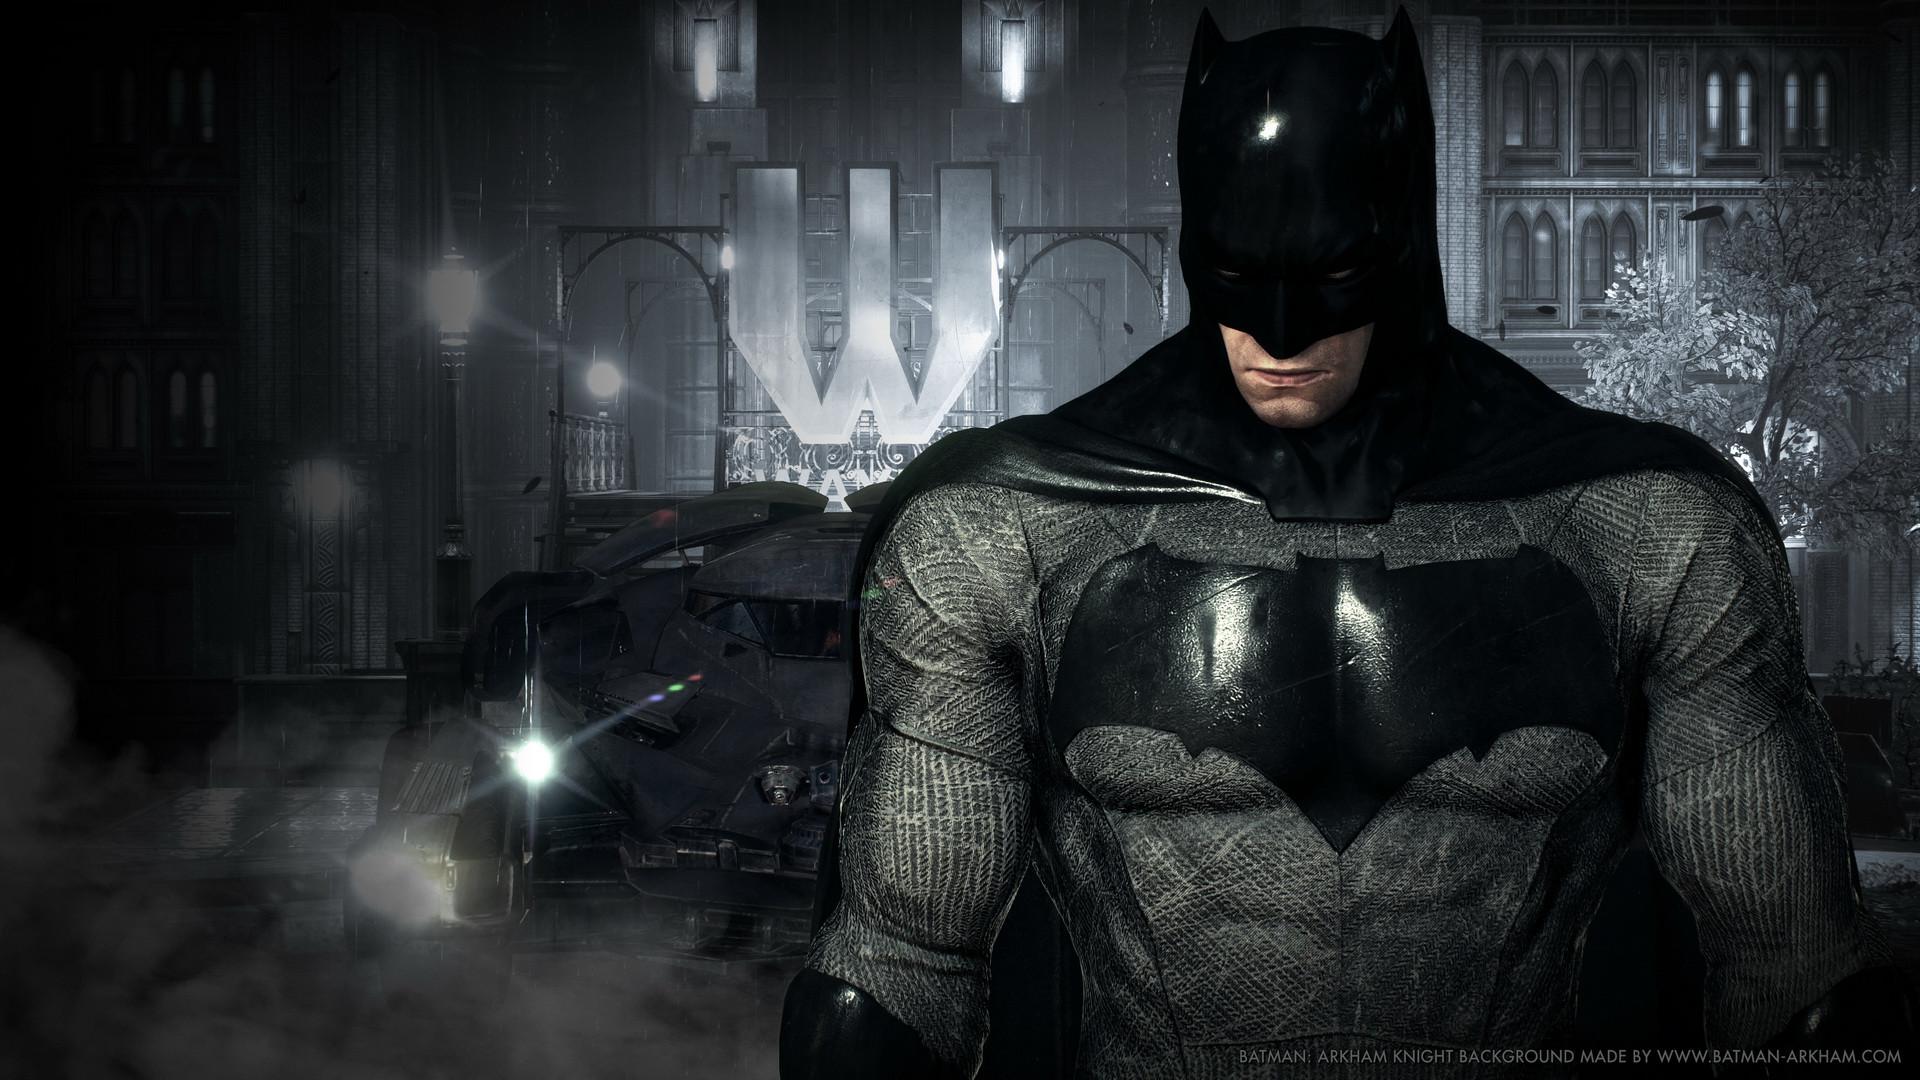 Superman Batman Wallpaper 70 Pictures